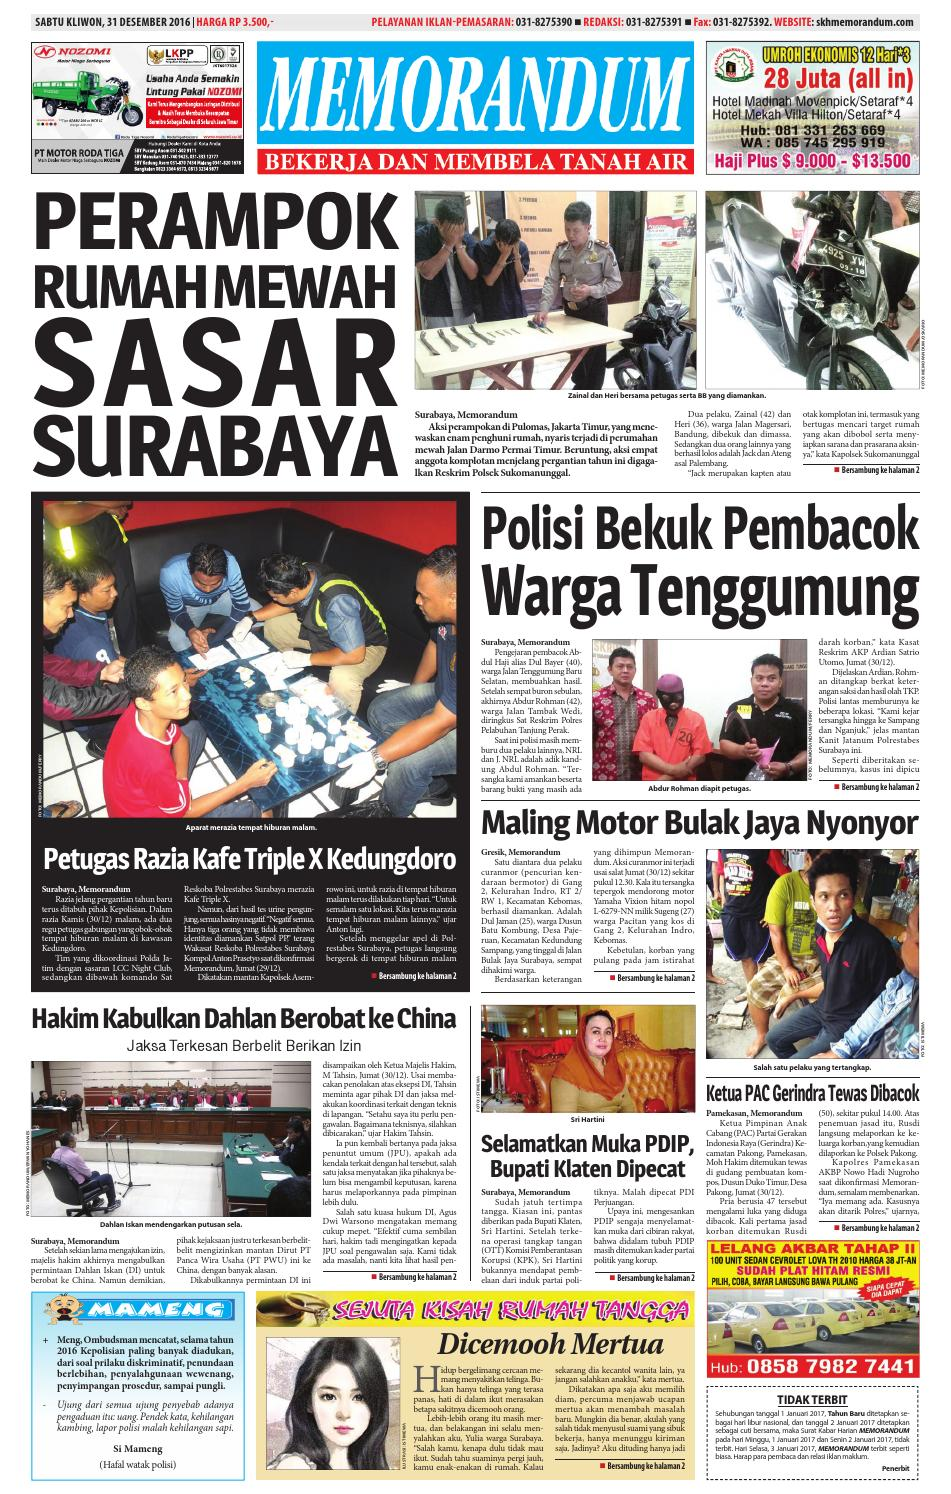 memorandum edisi 31 desember 2016 by memorandum issuu